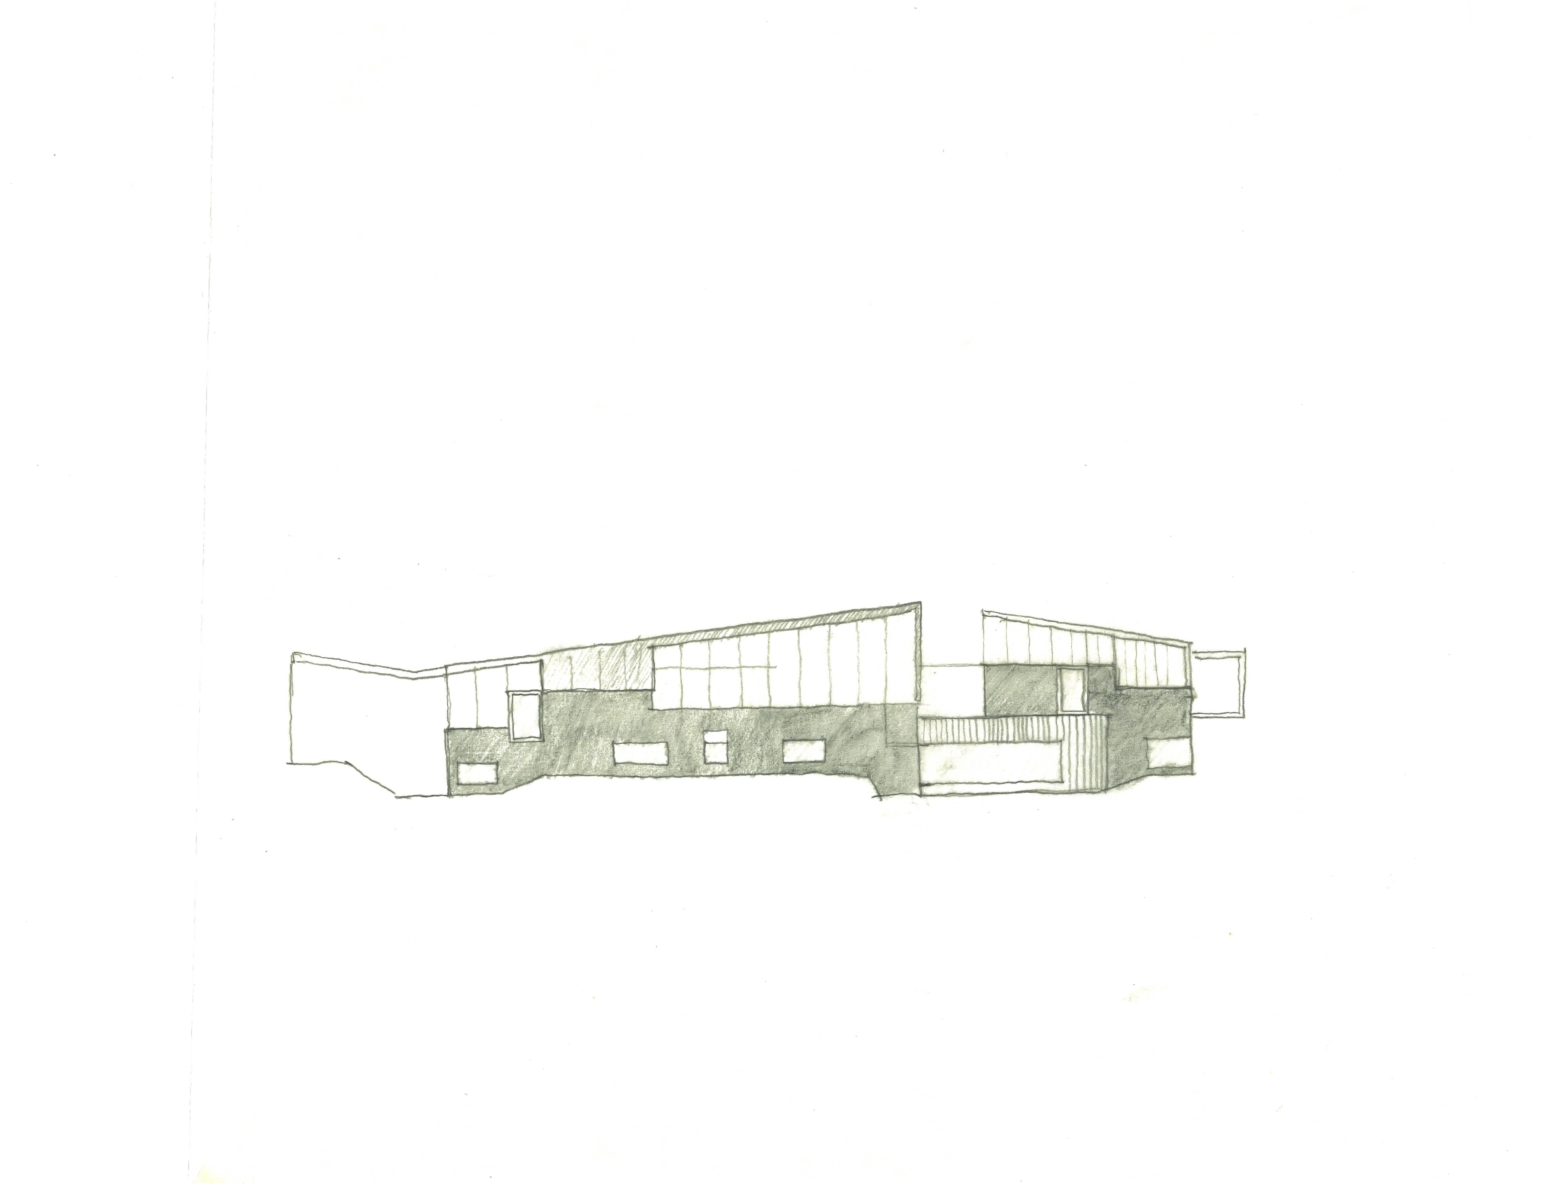 OSh House sketch 4